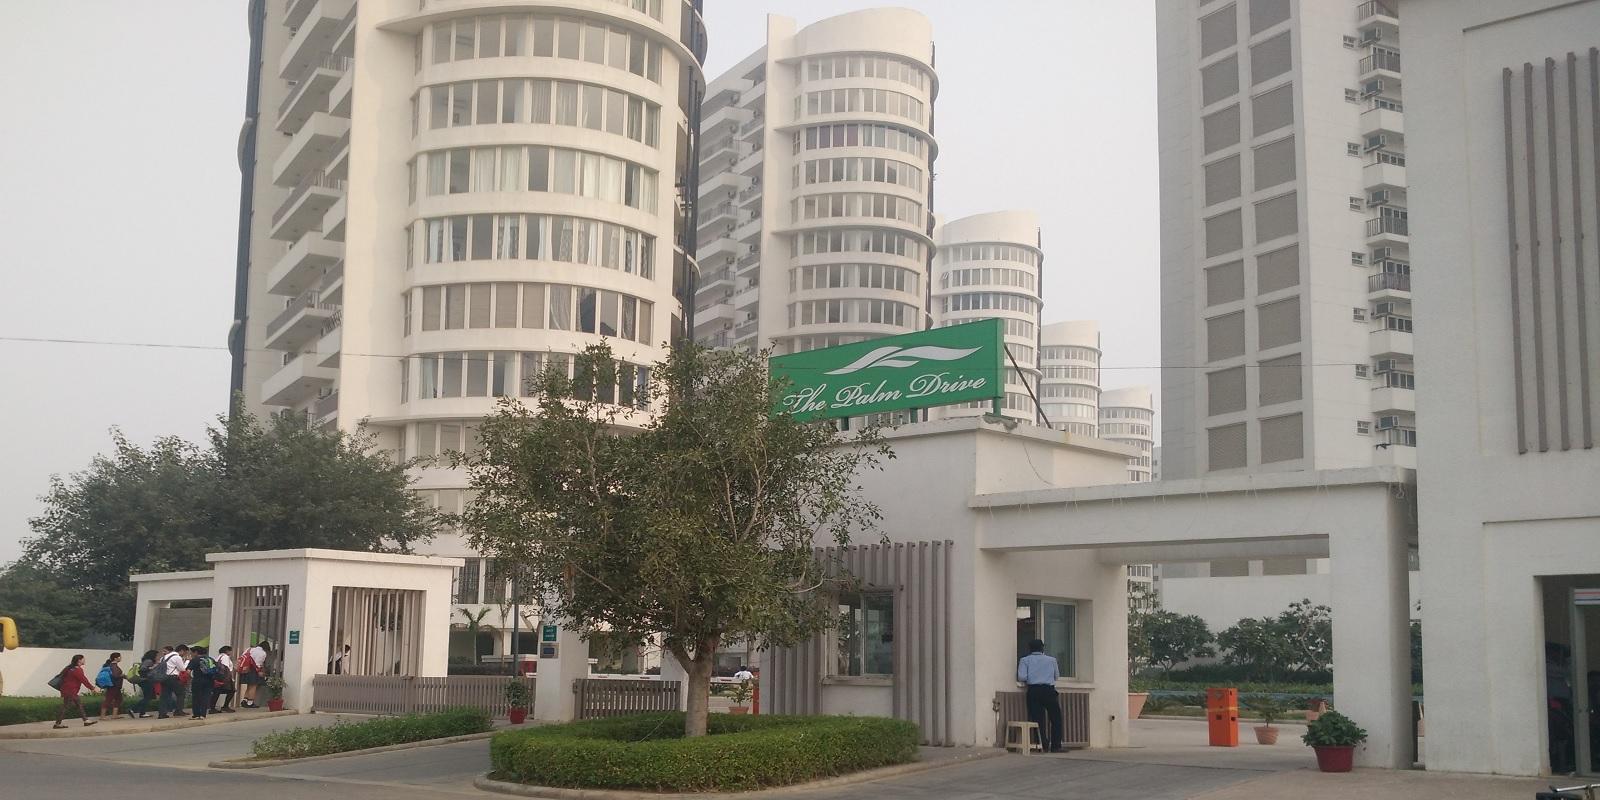 emaar the palm drive palm studios entrance view7